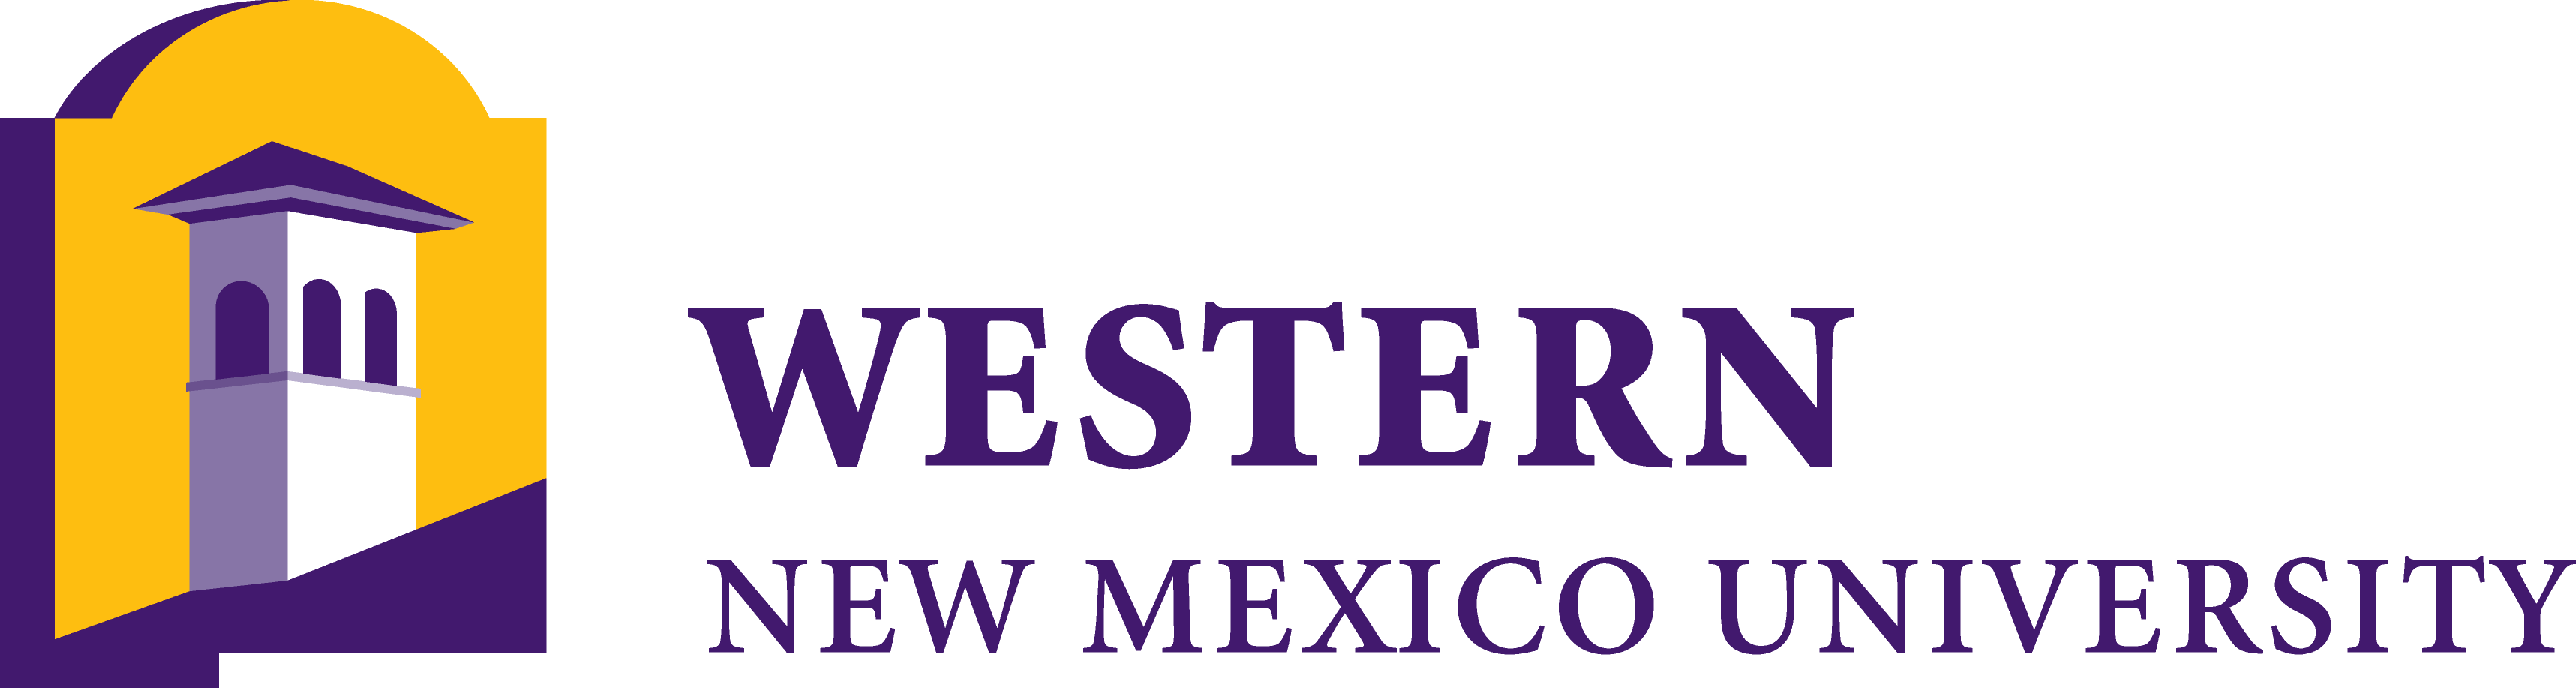 Western New Mexico University - Logo